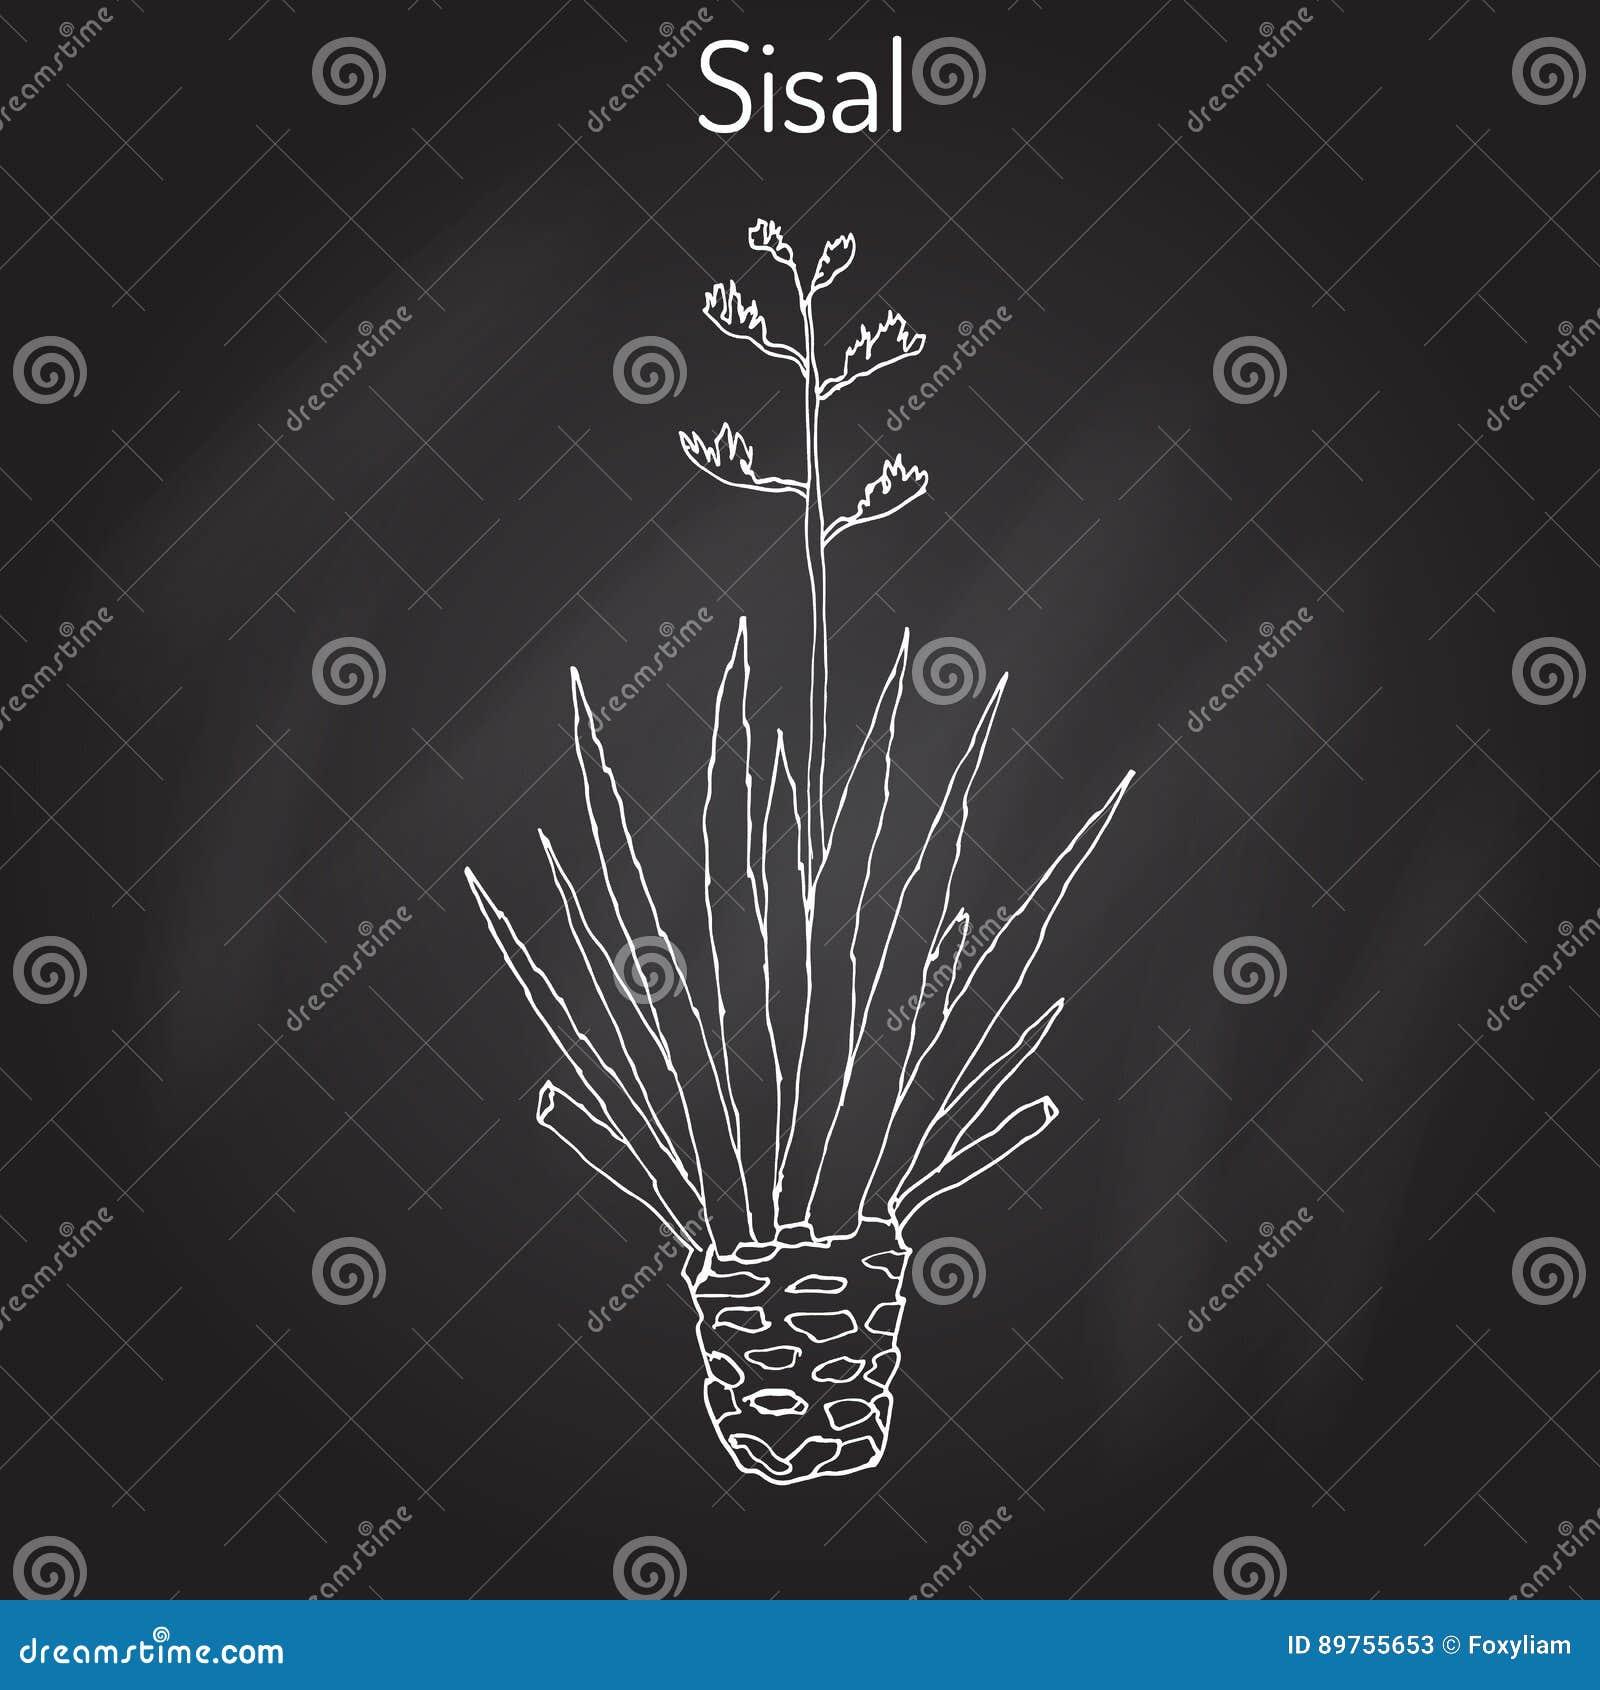 sisalana da agave do sisal planta de fibra